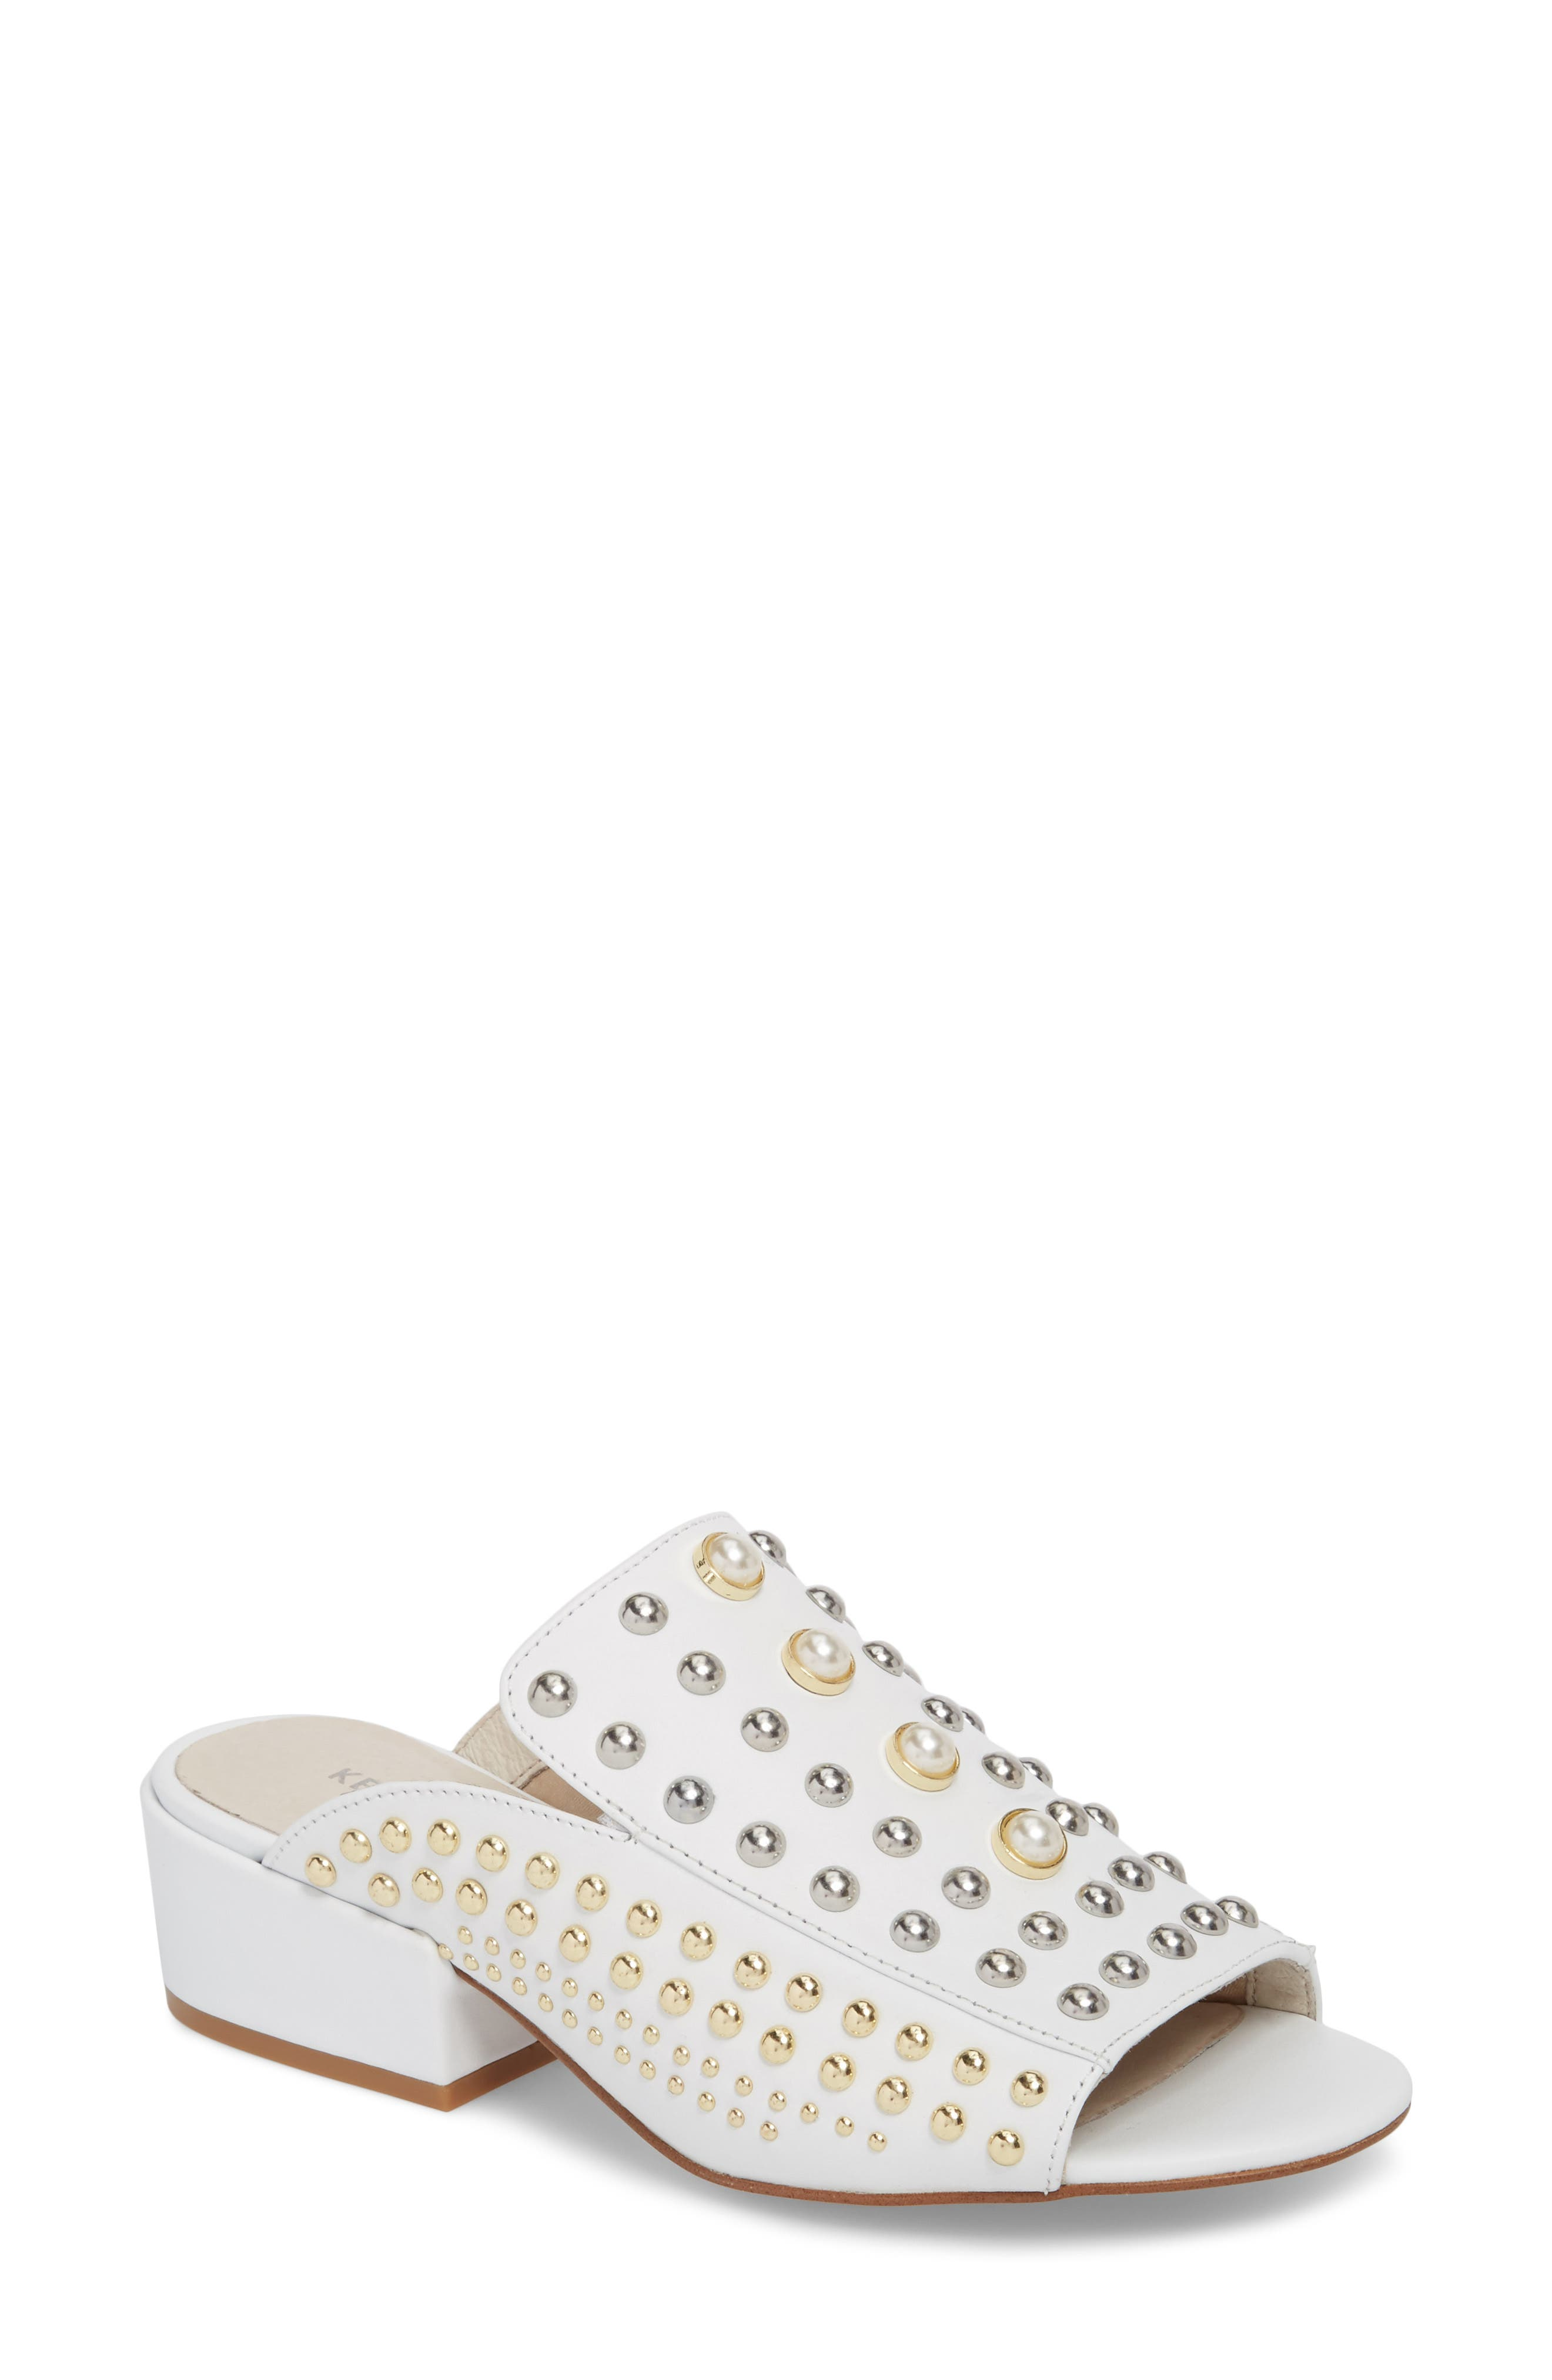 Kenneth Cole New York Farley Studded Slide Sandal (Women)